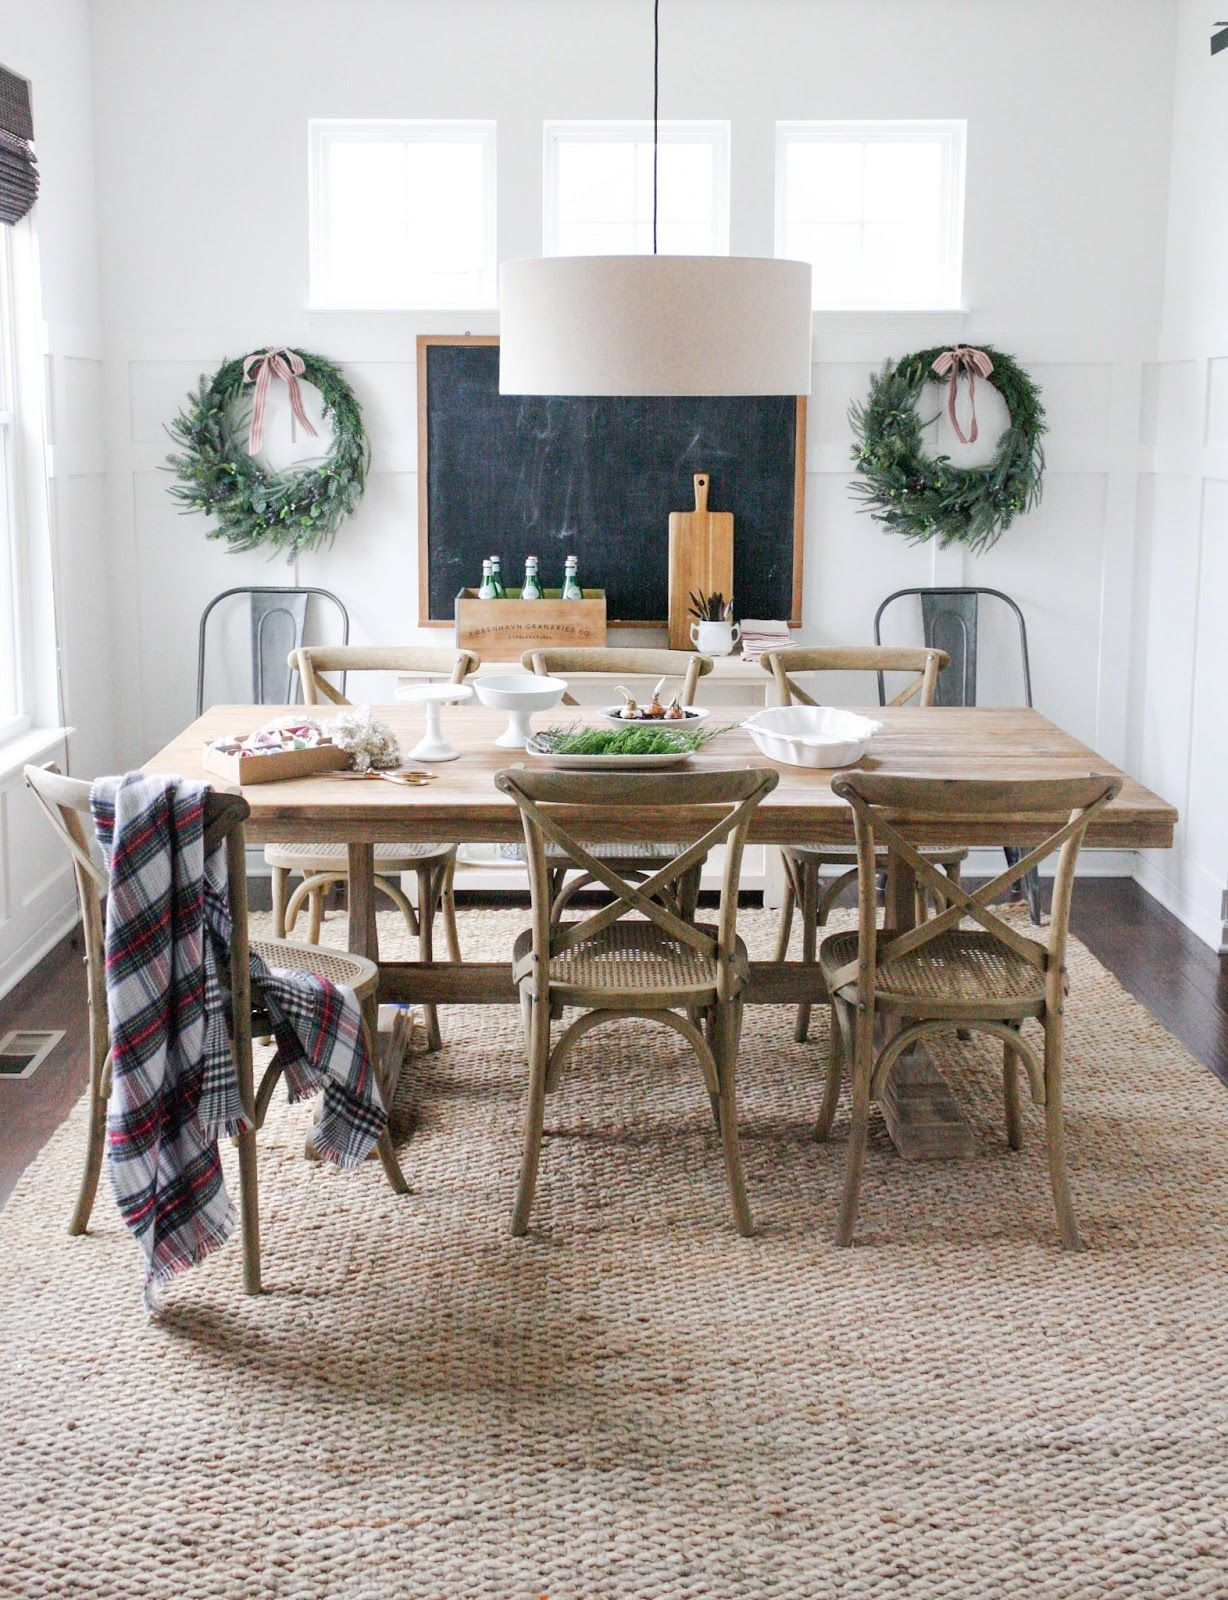 Restoration Hardware Kitchen Table Unfinished Oak Cabinets Home Depot Jute Rug From Rugs Usa Dining World Market